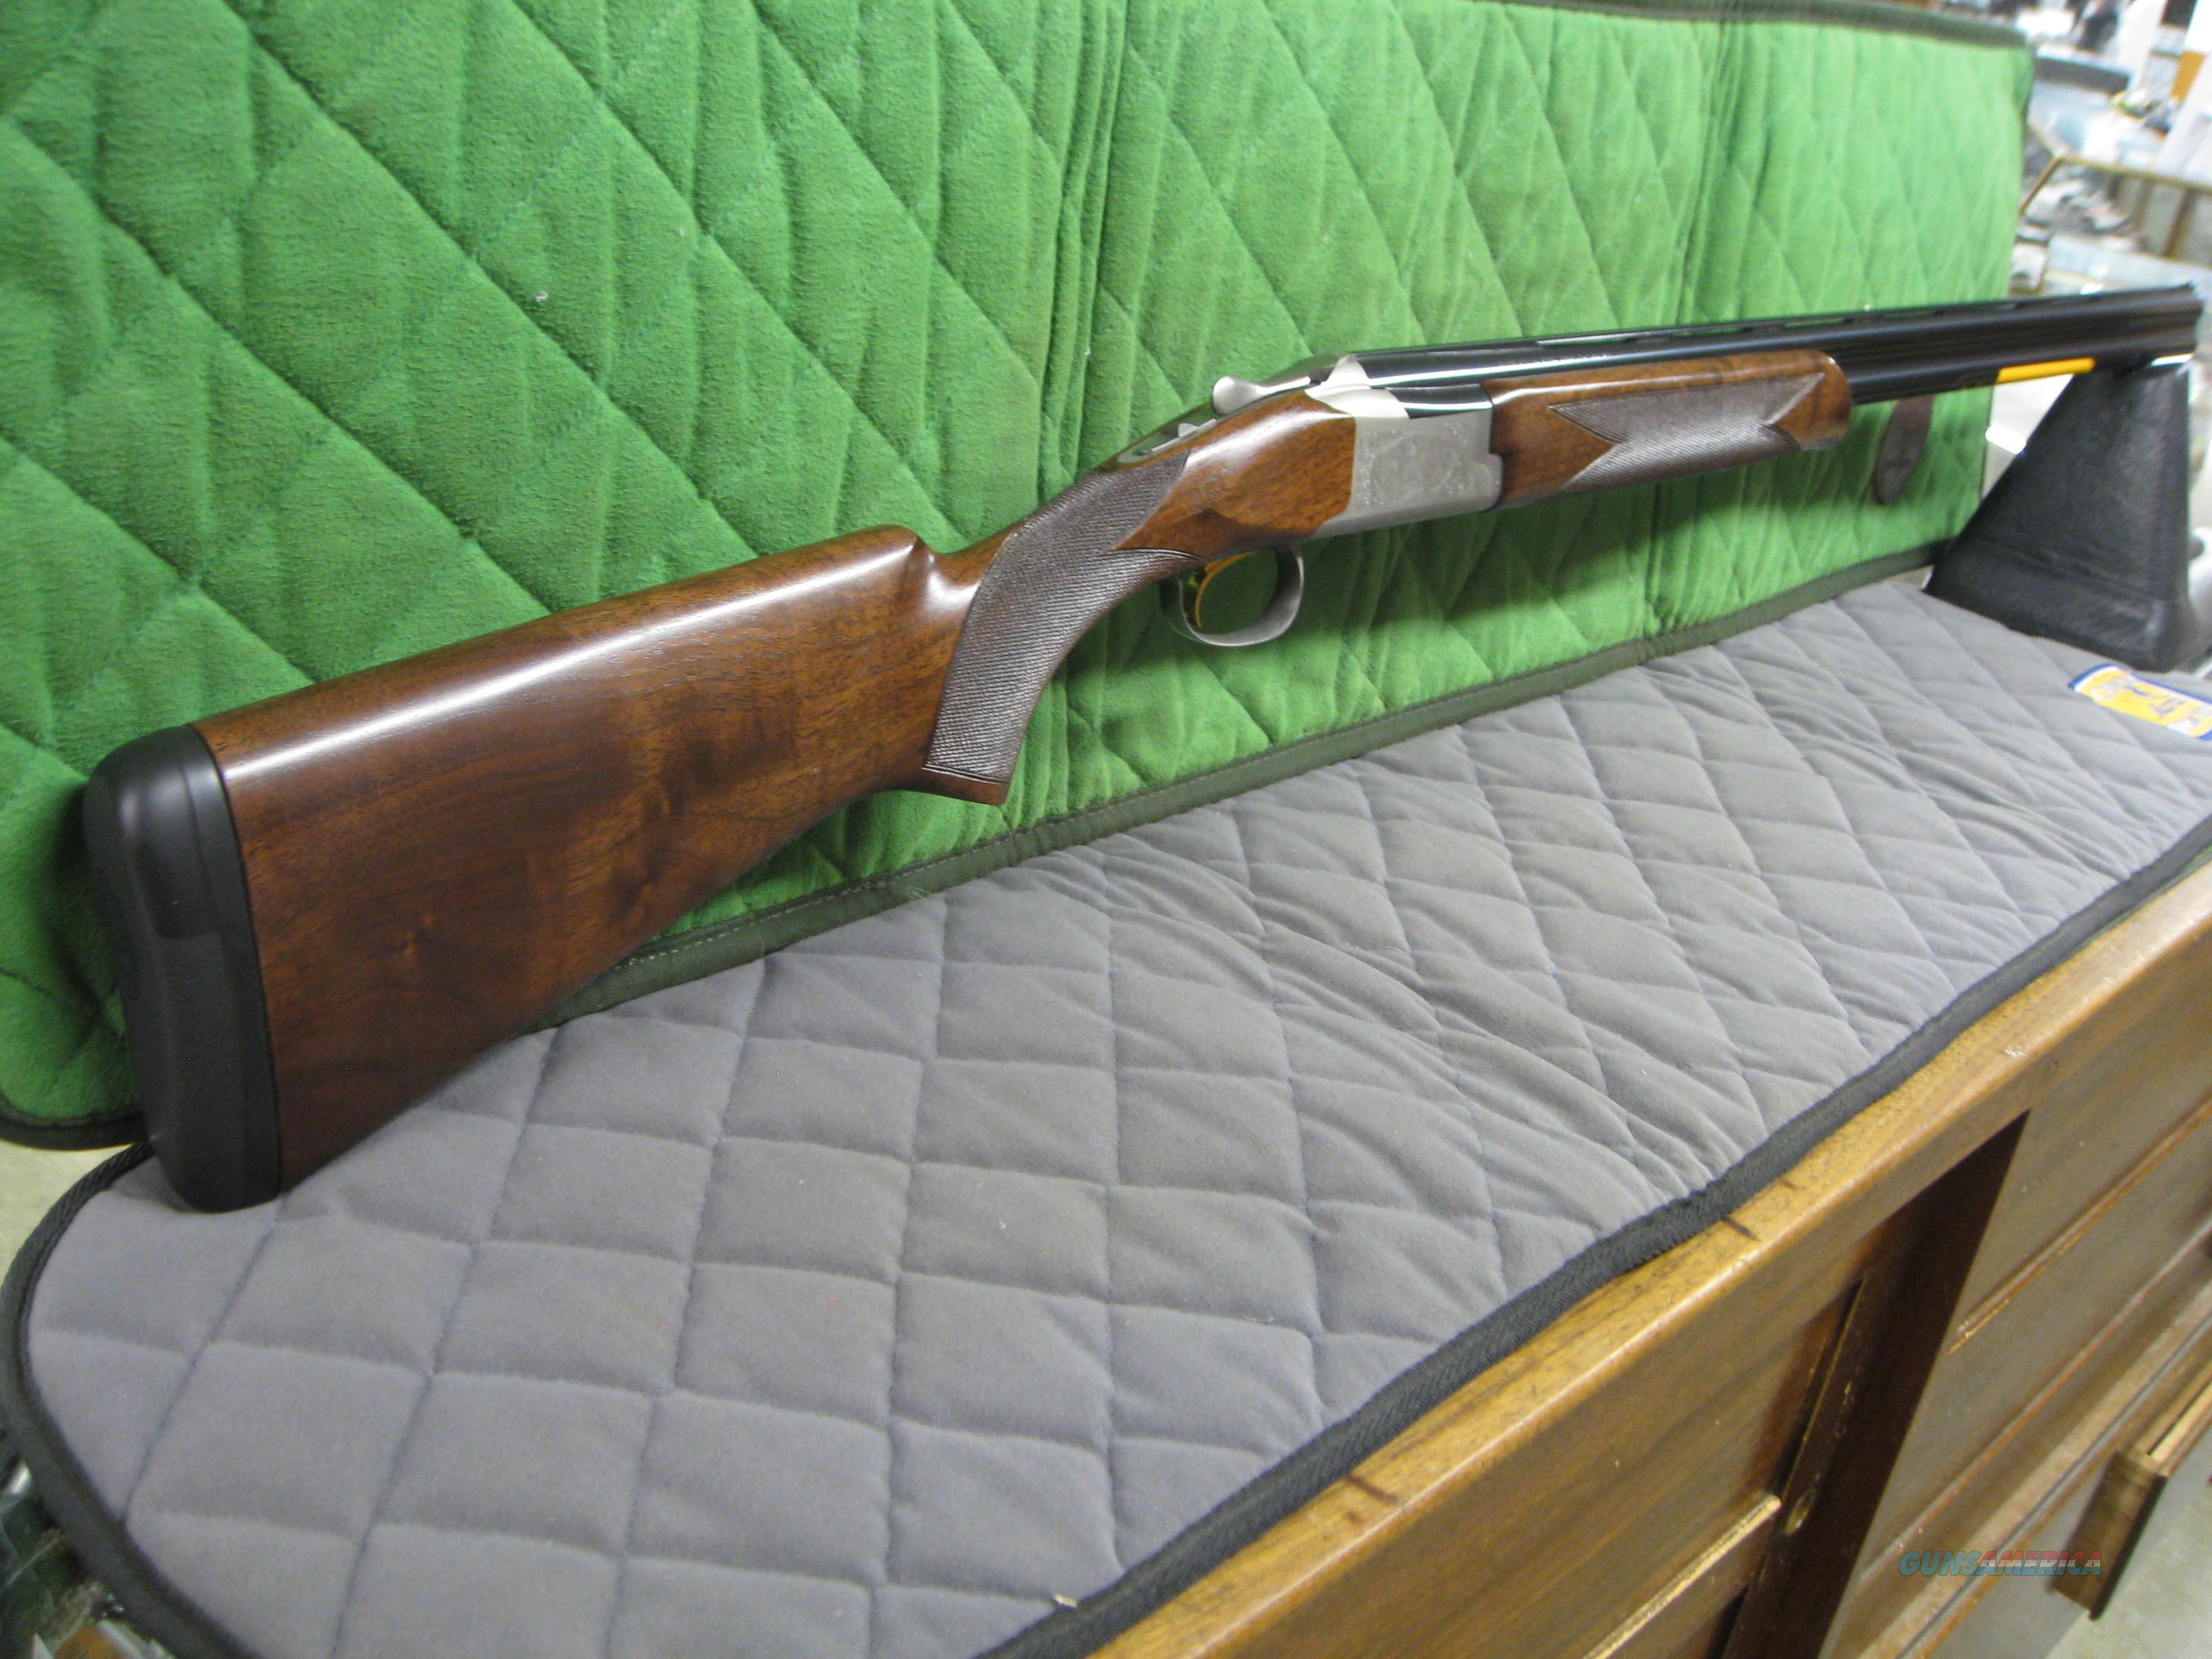 Browning Citori 725 Field 20 Gauge 28 Inch **NEW**  Guns > Shotguns > Browning Shotguns > Over Unders > Citori > Hunting